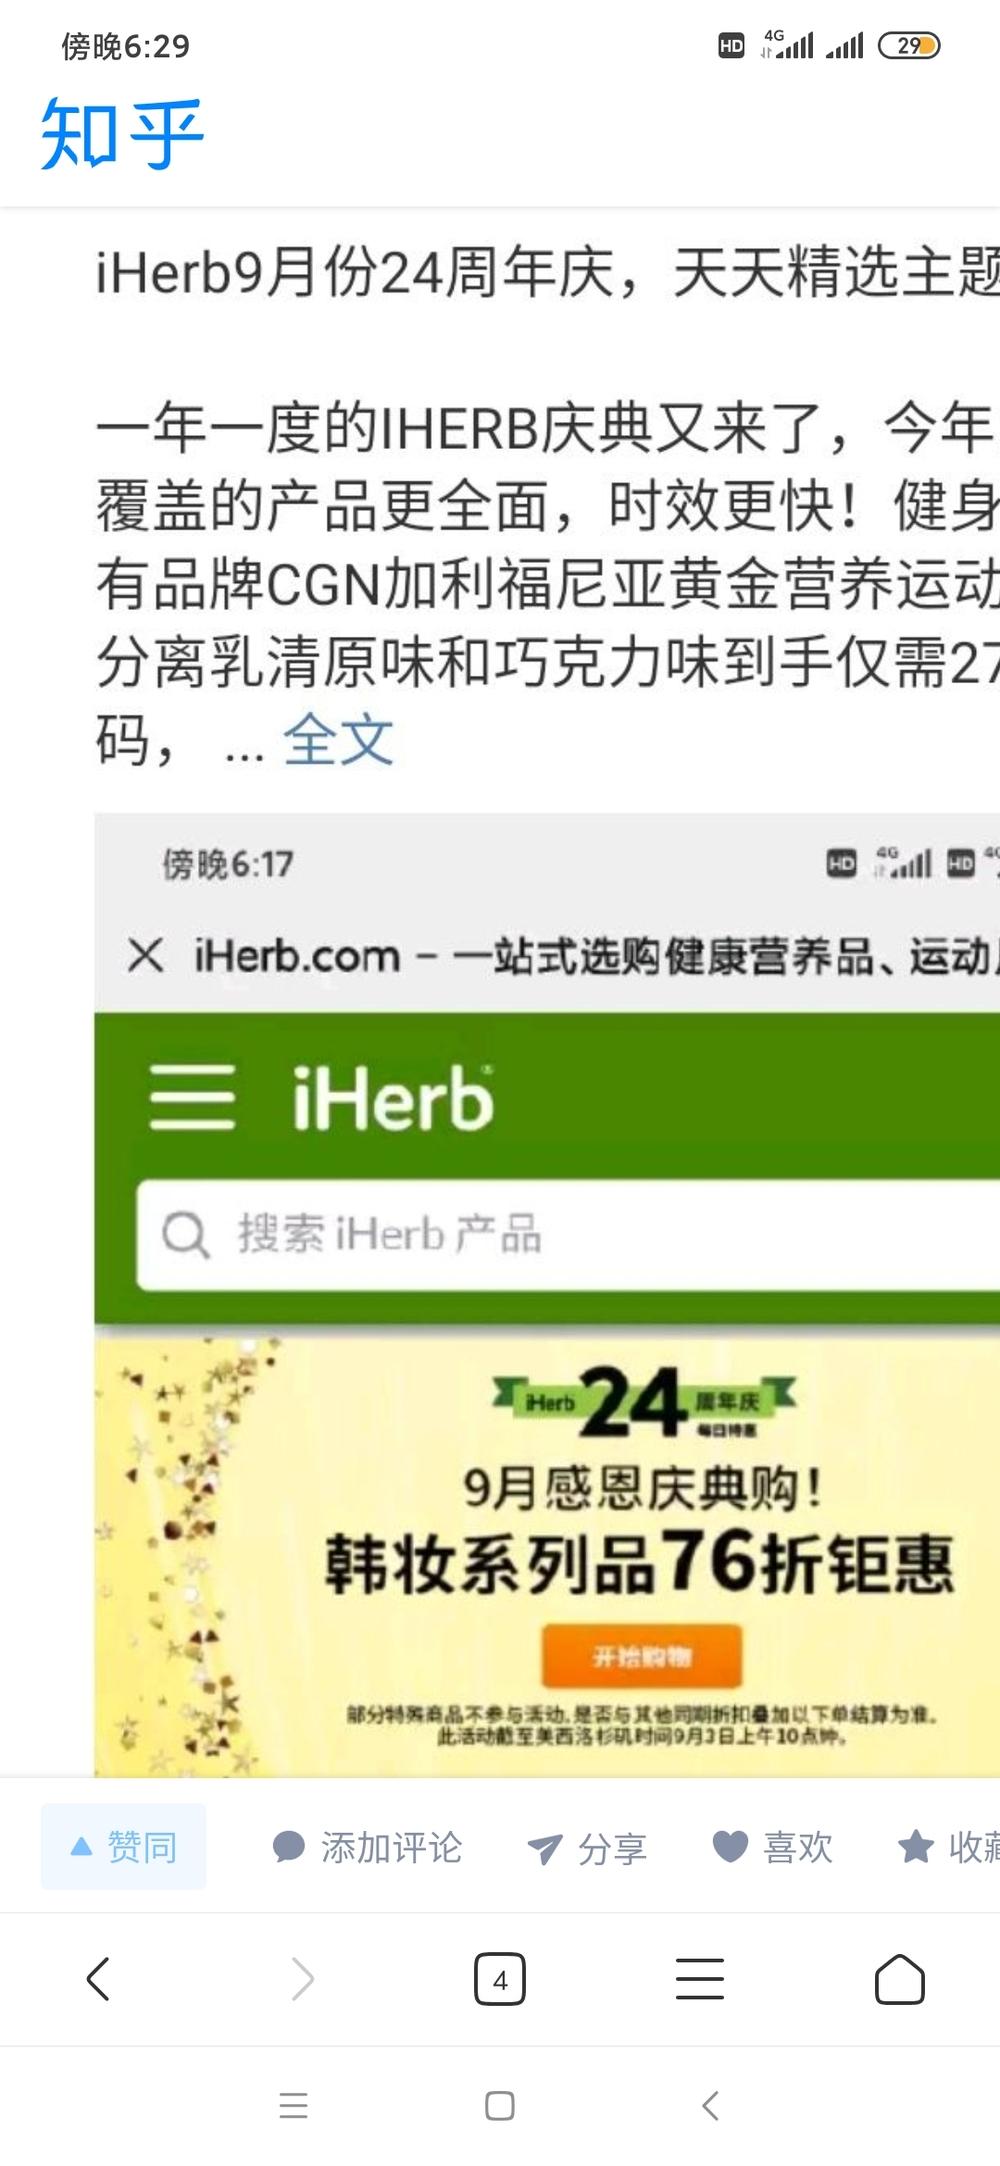 Screenshot_2020-09-03-18-29-31-310_com.android.browser.jpg